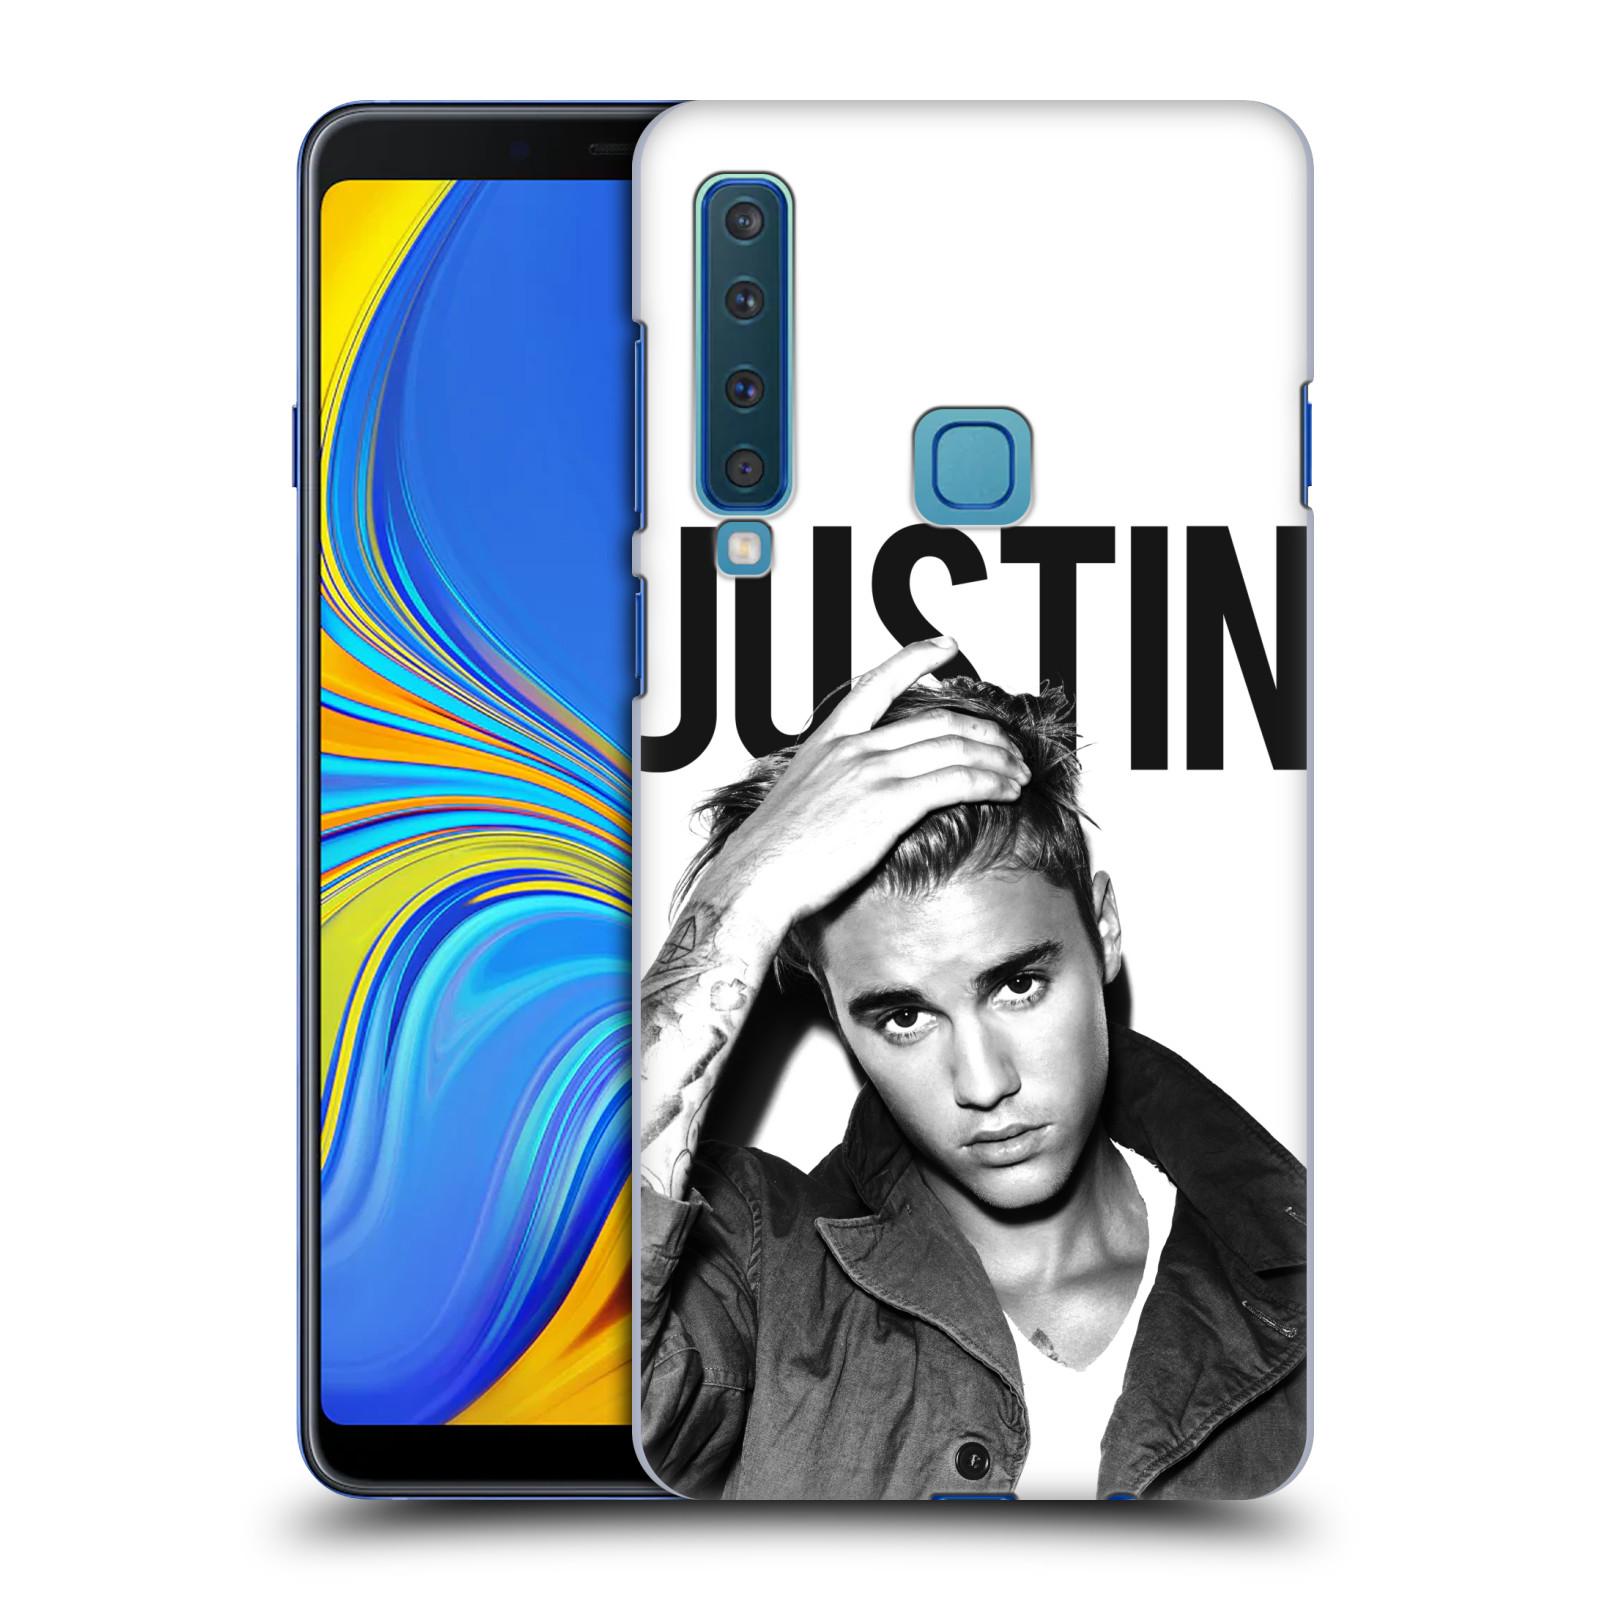 Plastové pouzdro na mobil Samsung Galaxy A9 (2018) - Head Case - Justin Bieber Official - Póza